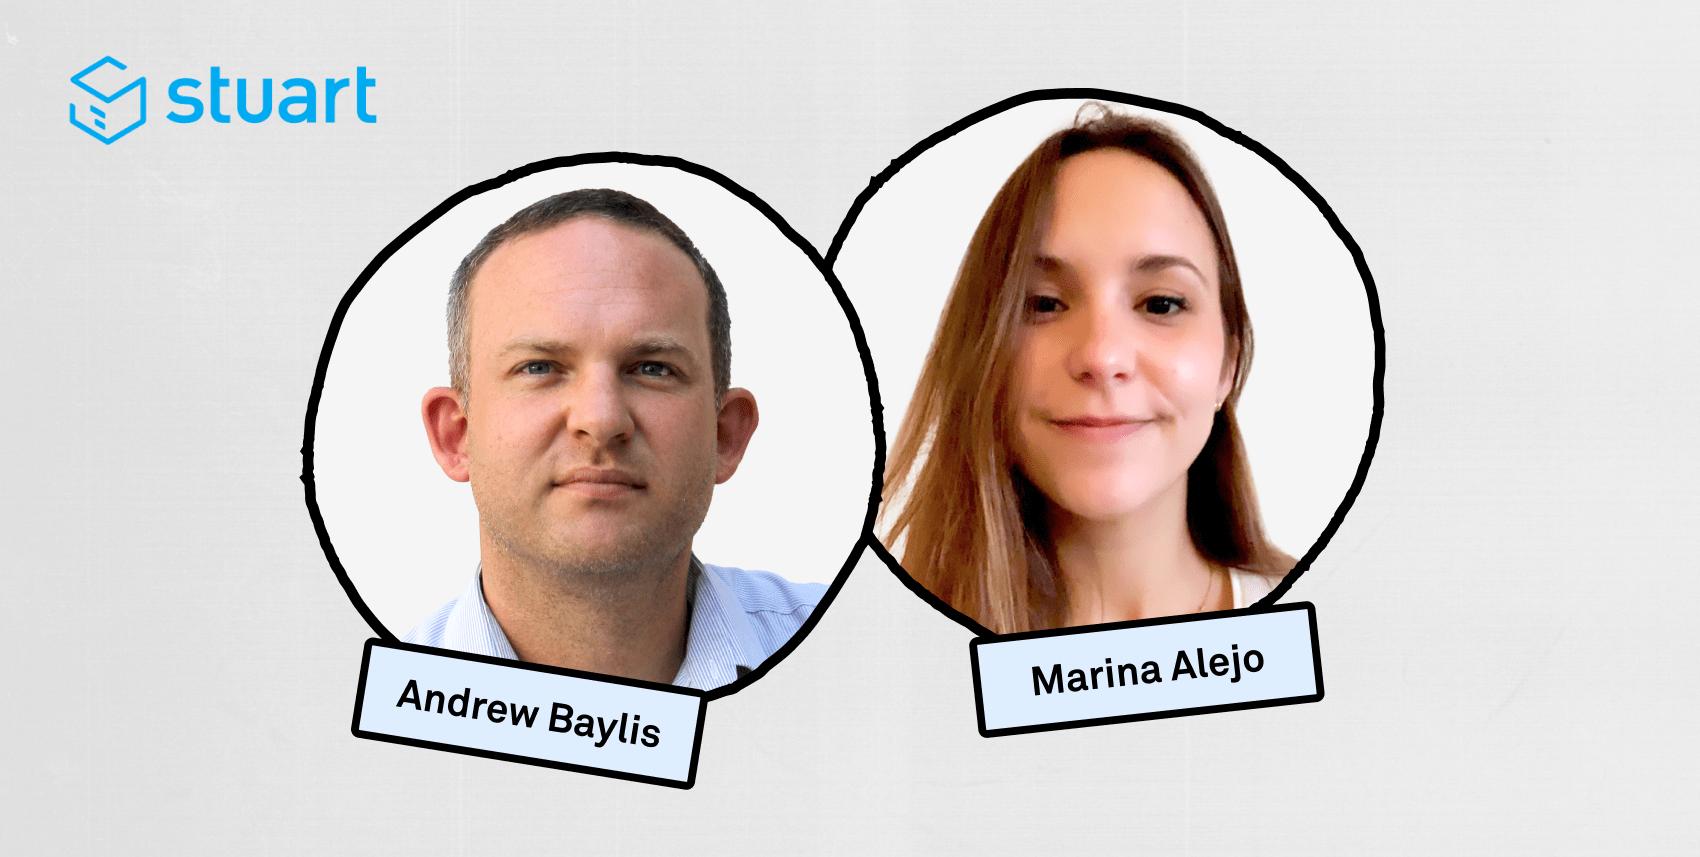 Andrew Baylis and Marina Alejo